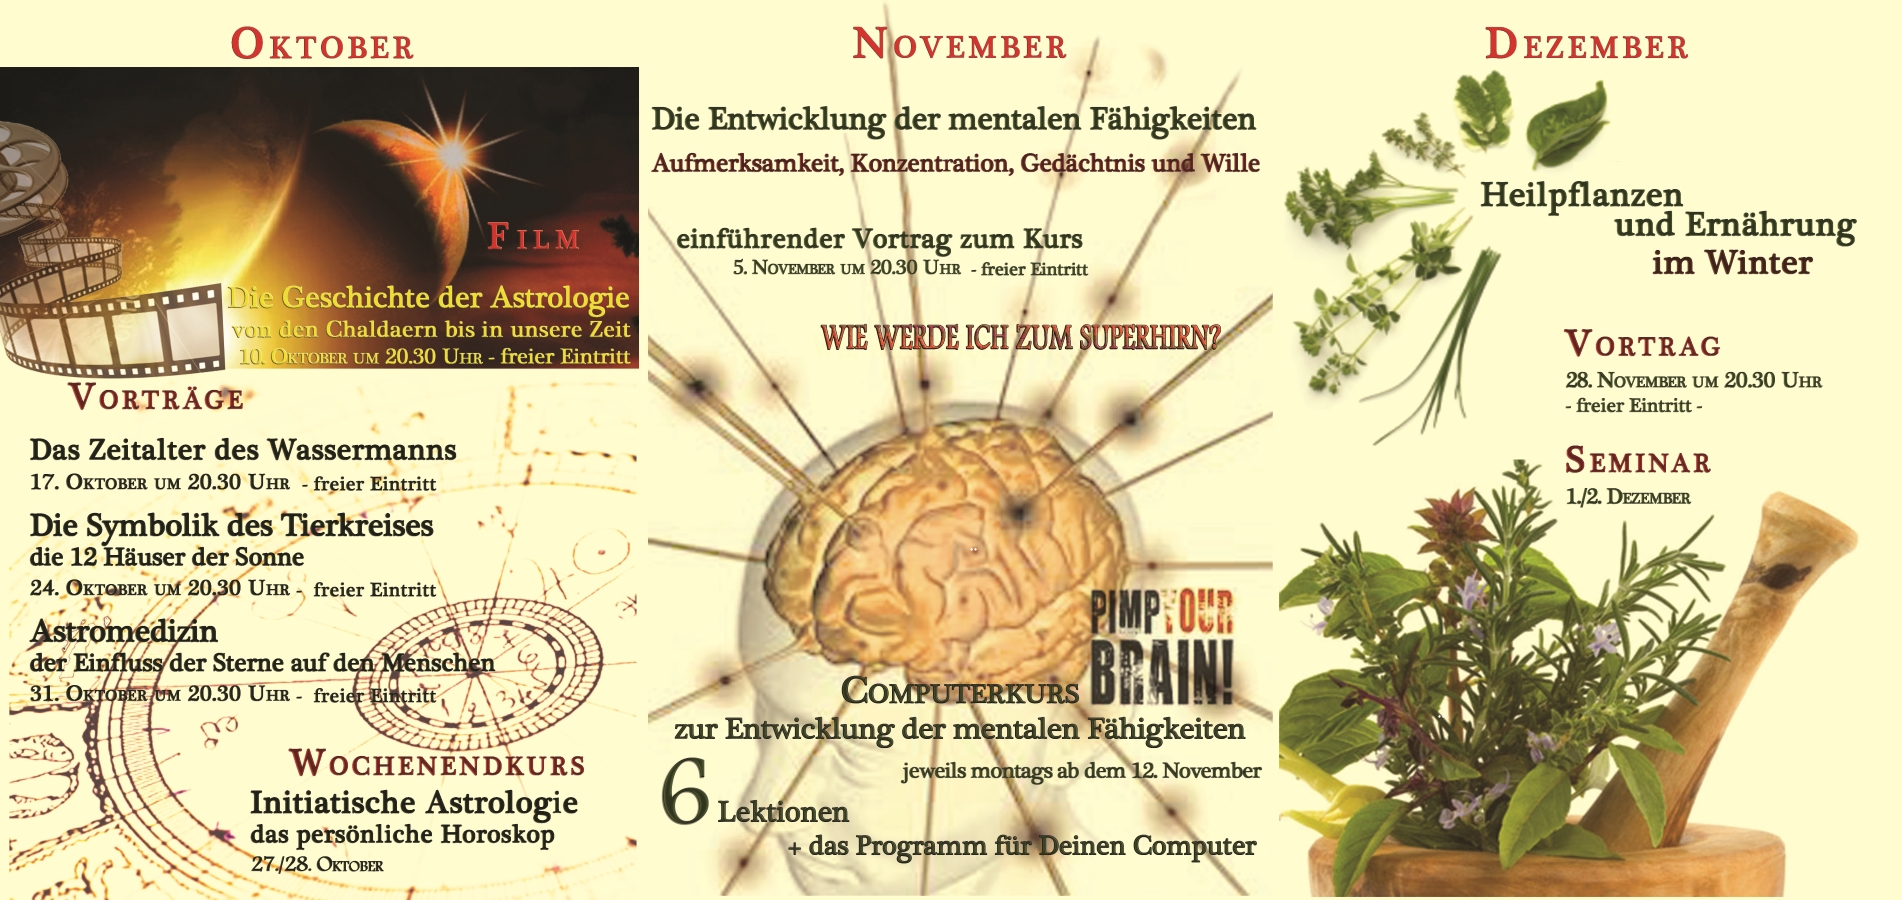 Themenreihe Oktober bis Dezember 2012